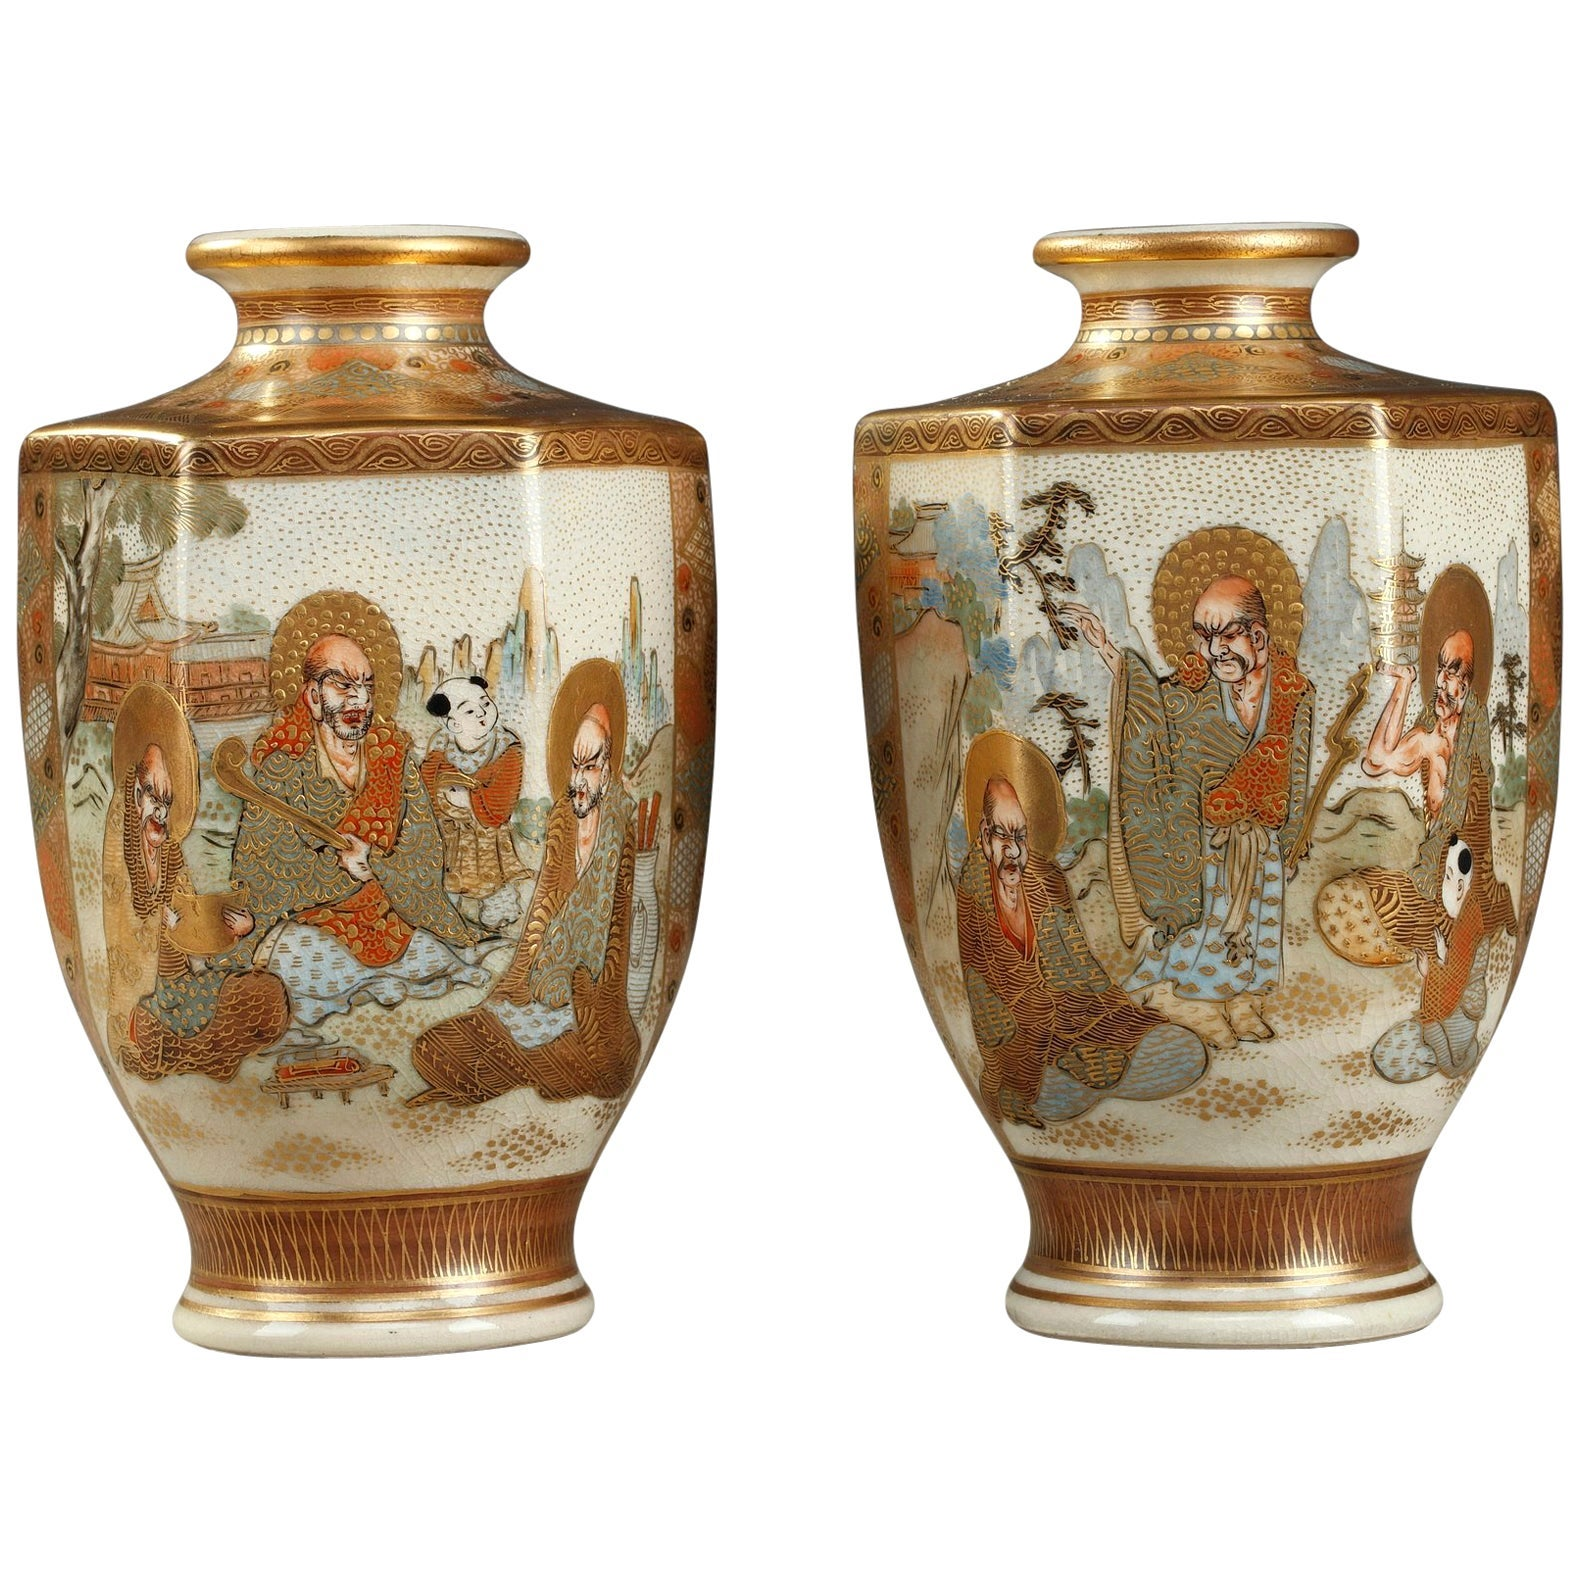 20th Century Pair of Small Porcelain Satsuma Vases